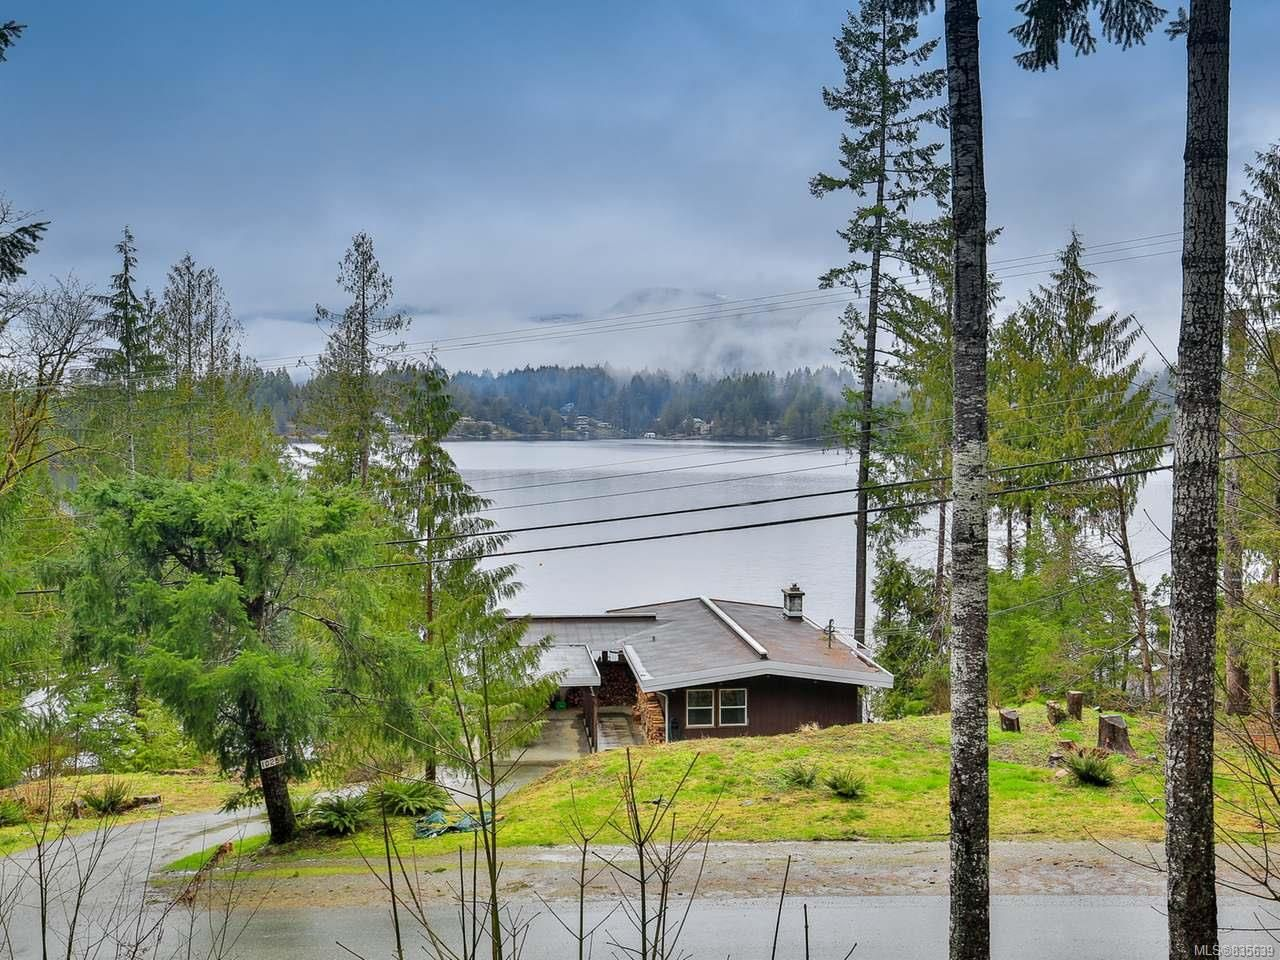 Photo 38: Photos: 9657 Faber Rd in PORT ALBERNI: PA Sproat Lake House for sale (Port Alberni)  : MLS®# 835639